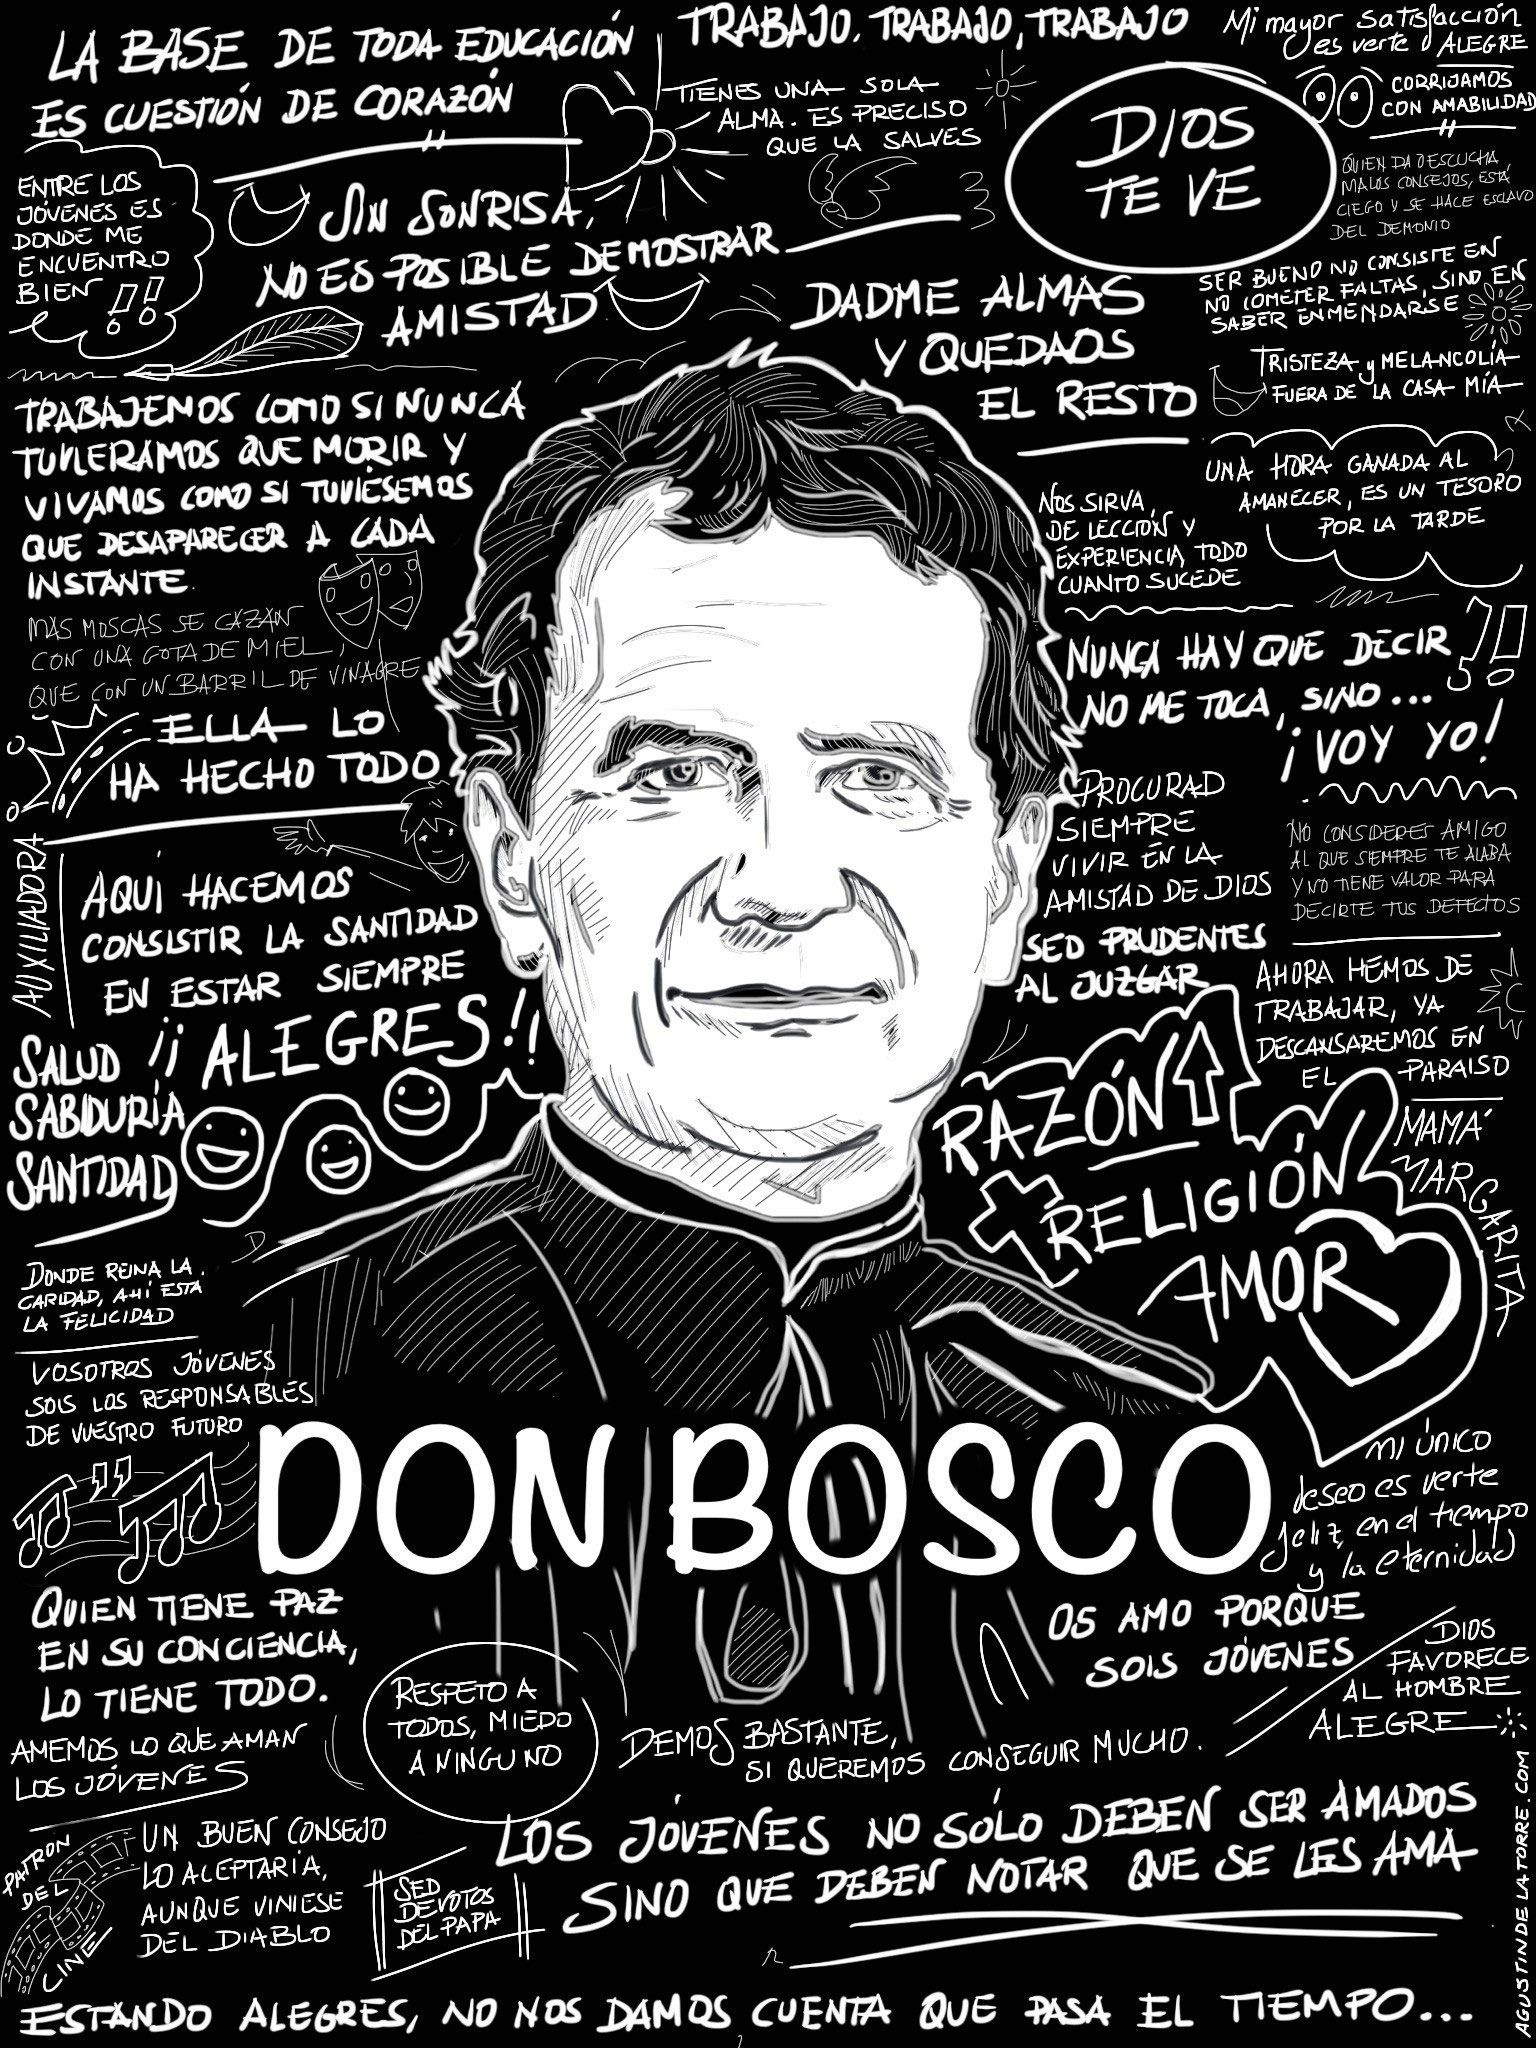 54 Ideas De Don Bosco Salesianas Juan Bosco Bosco